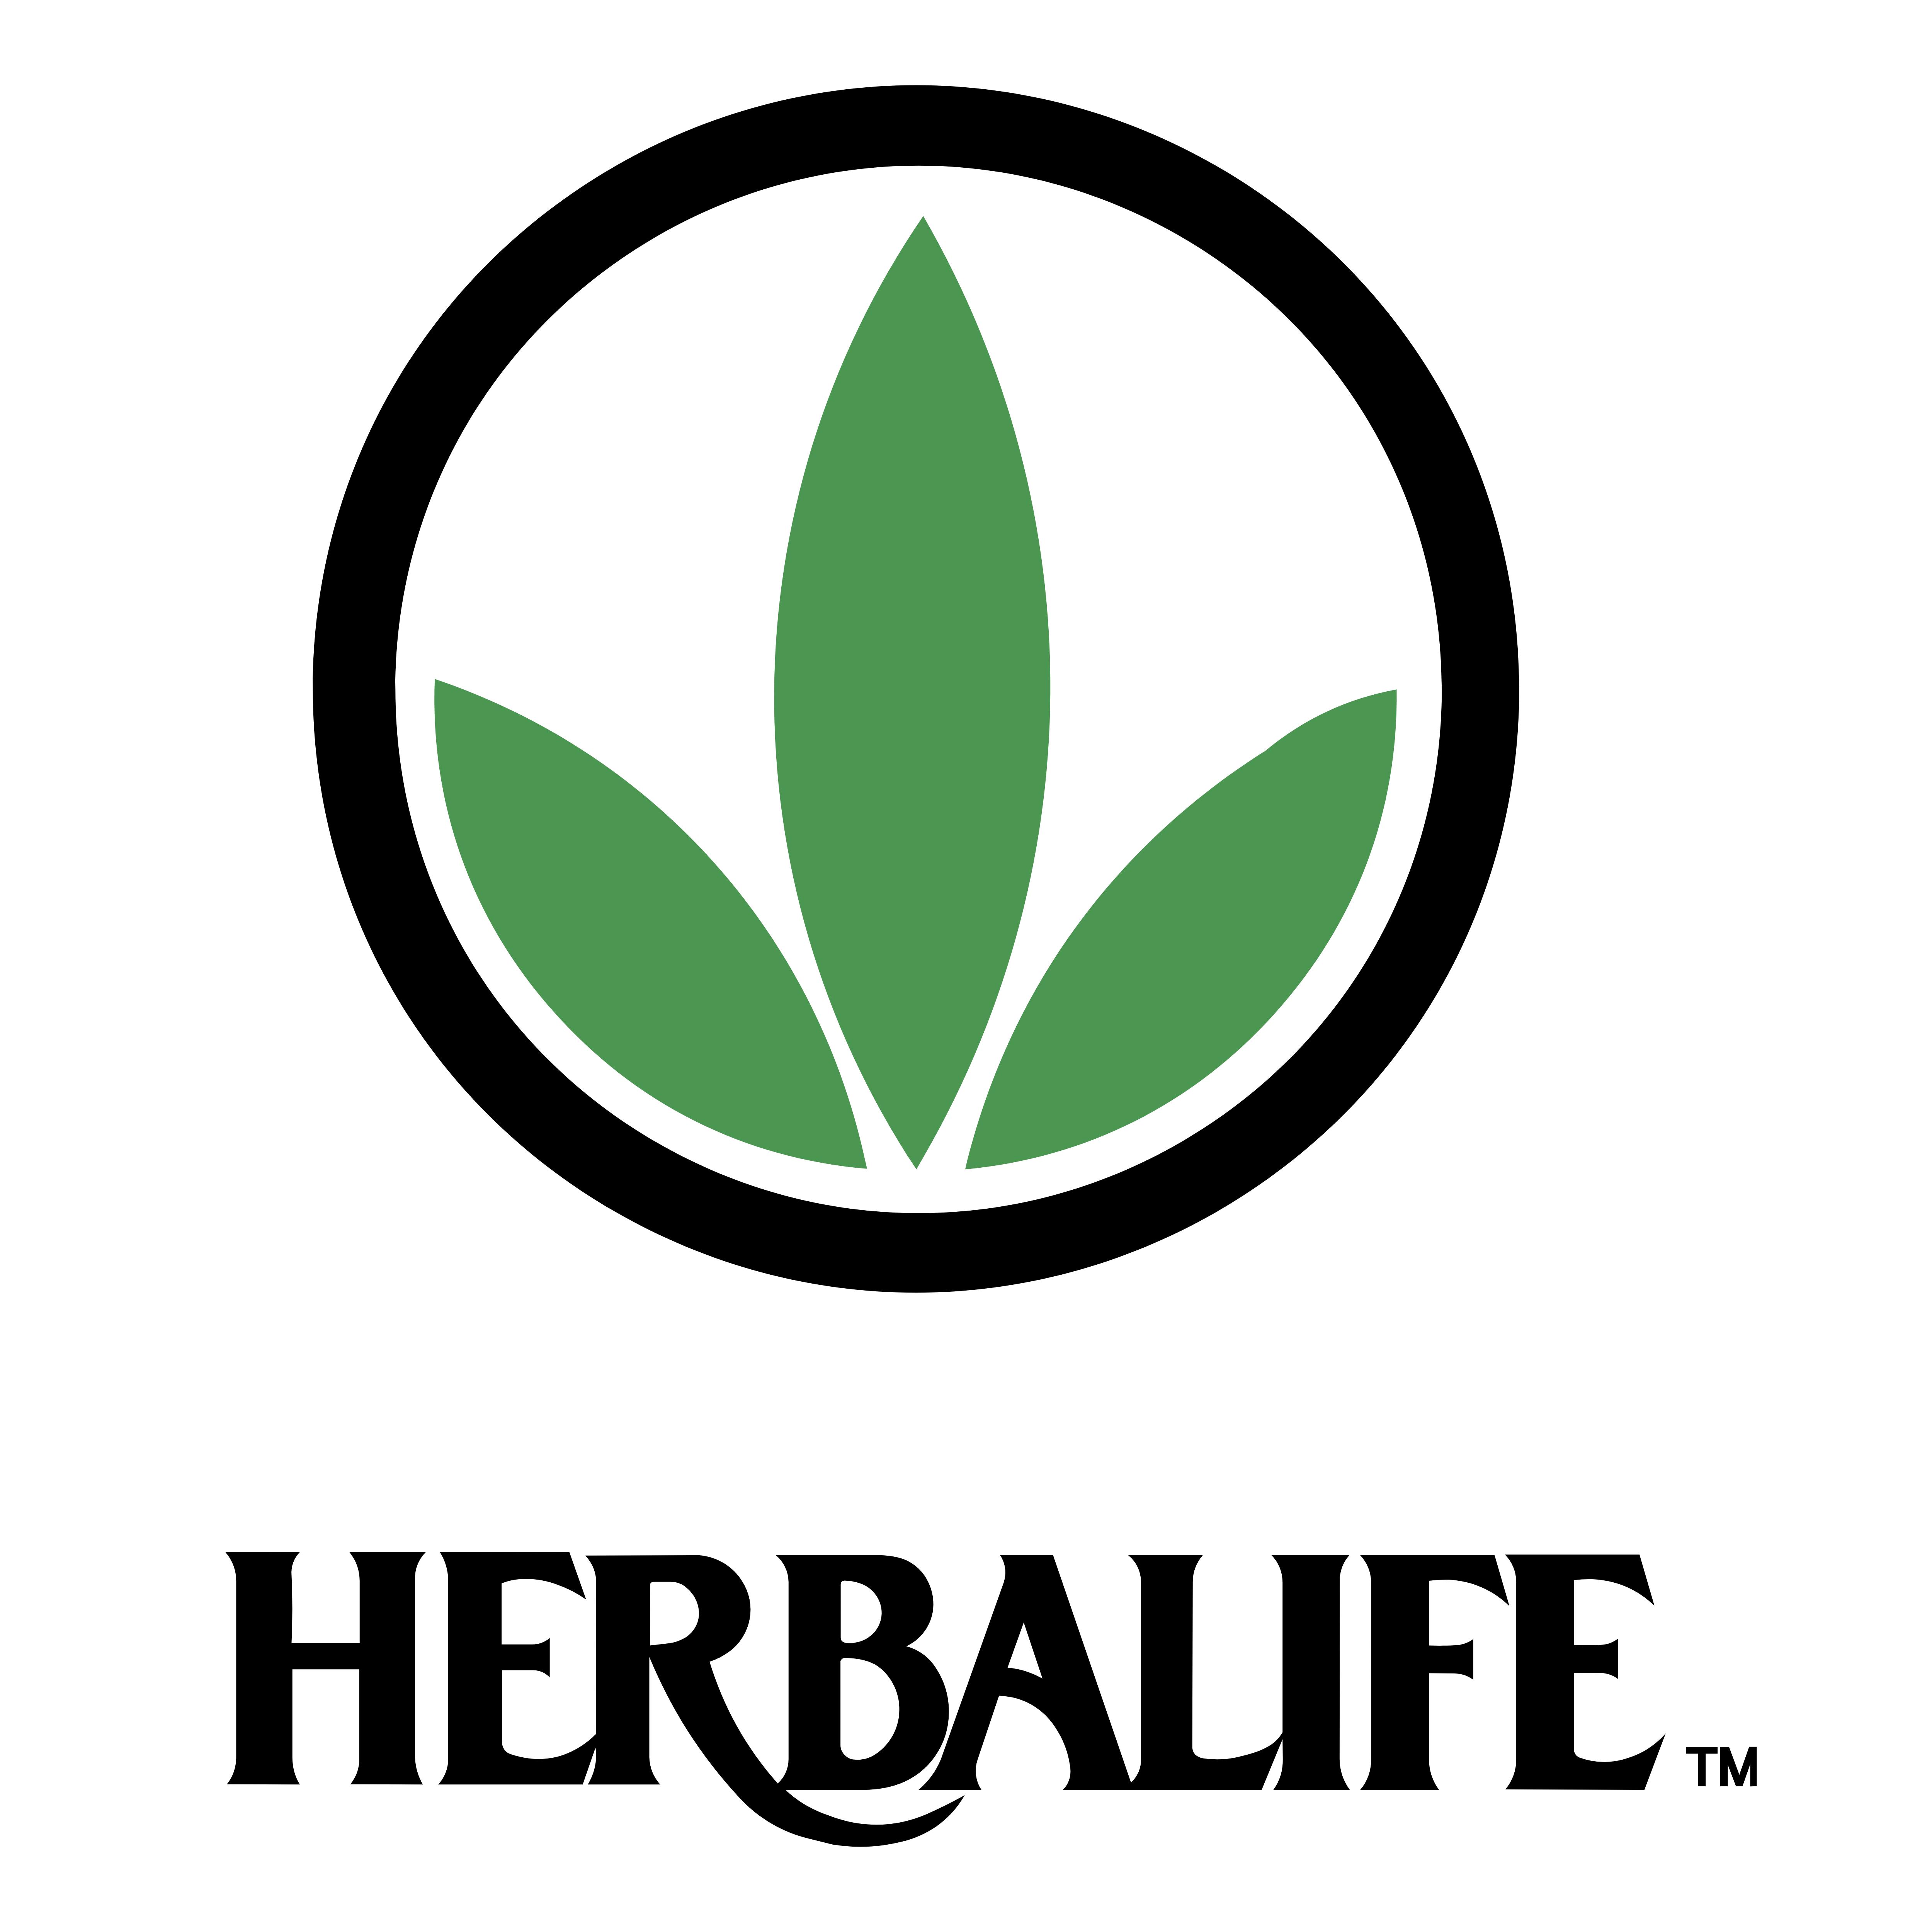 herbalife logos download rh logos download com herbalife logo vector herbalife logo font